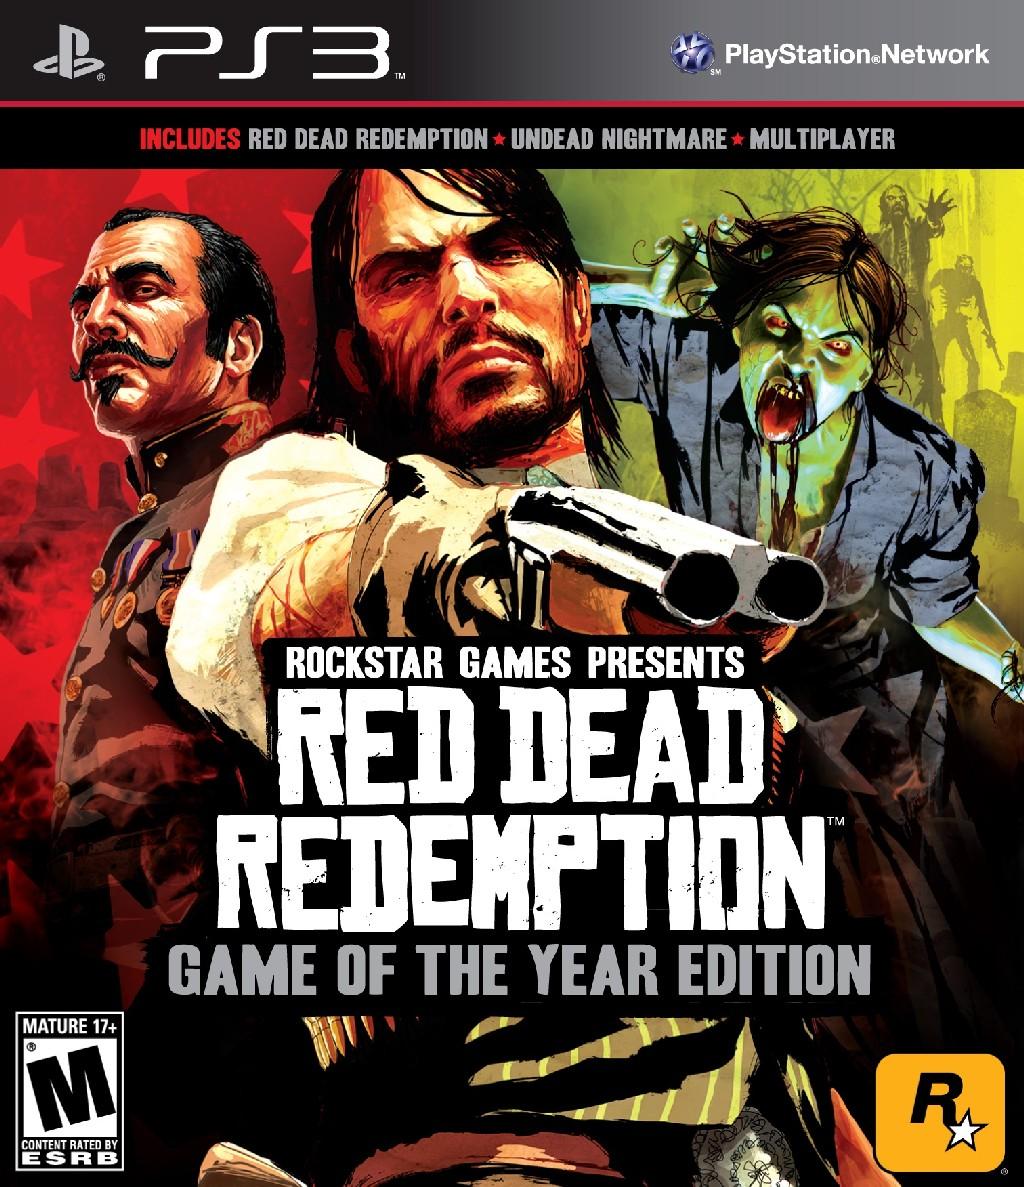 Ohlášena Red Dead Redemption GOTY edice 51646